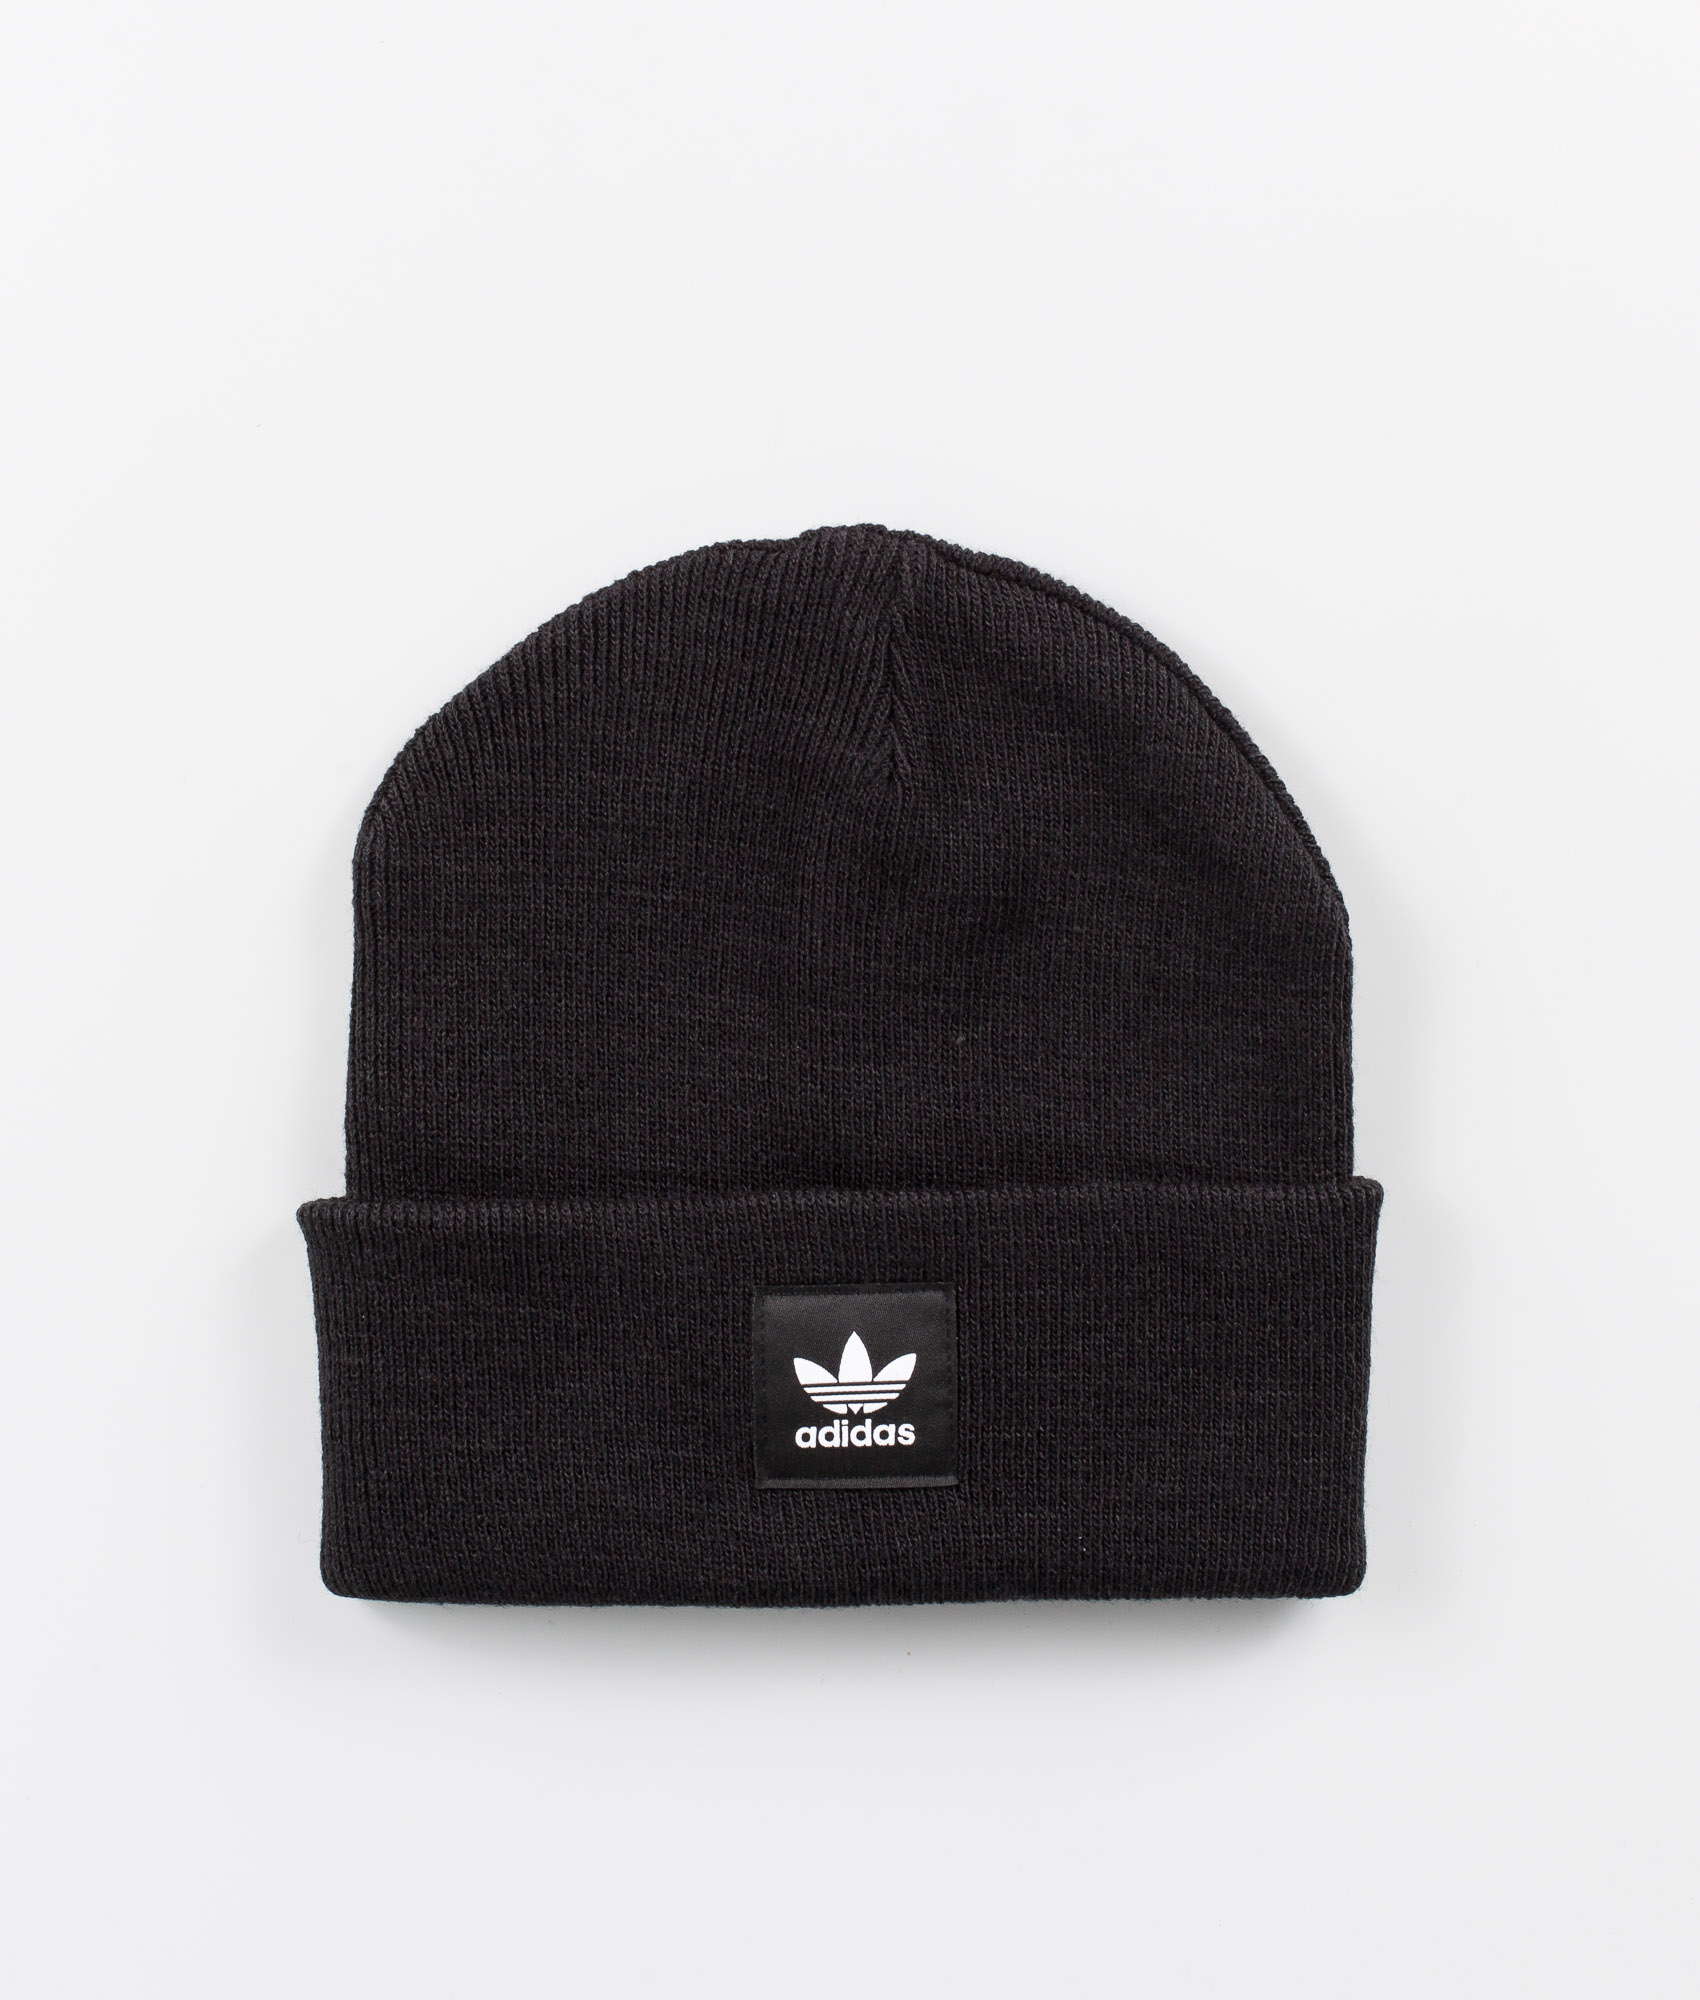 Adidas Originals Adicolor Cuff Knit Mössa Black